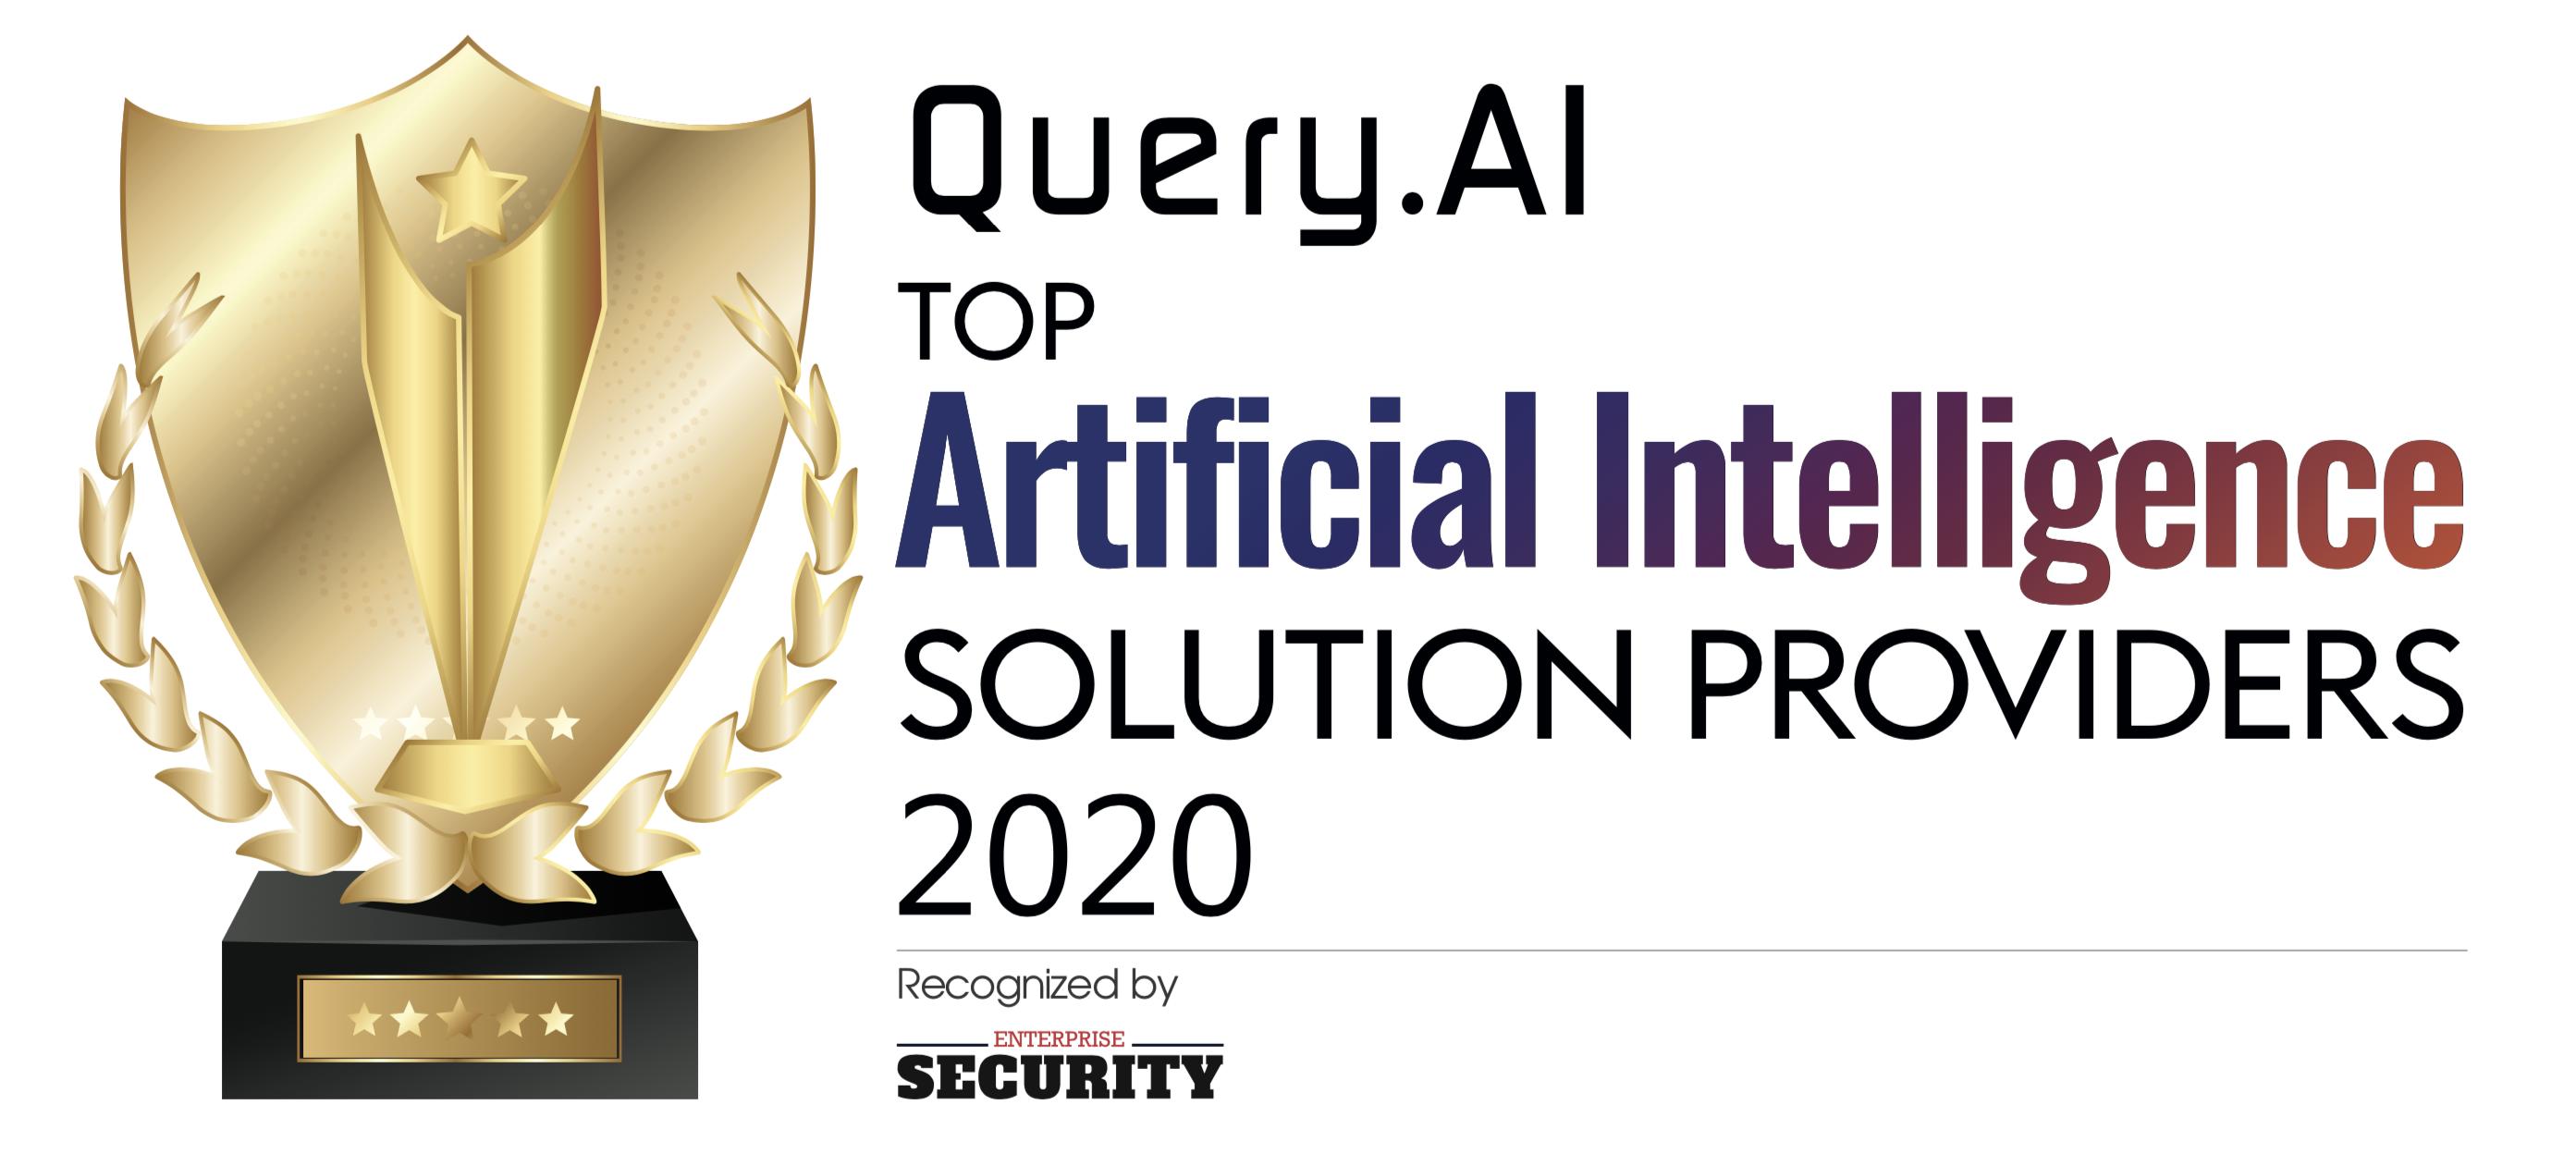 Enterprise Security Magazine: Query.AI Top AI Solution